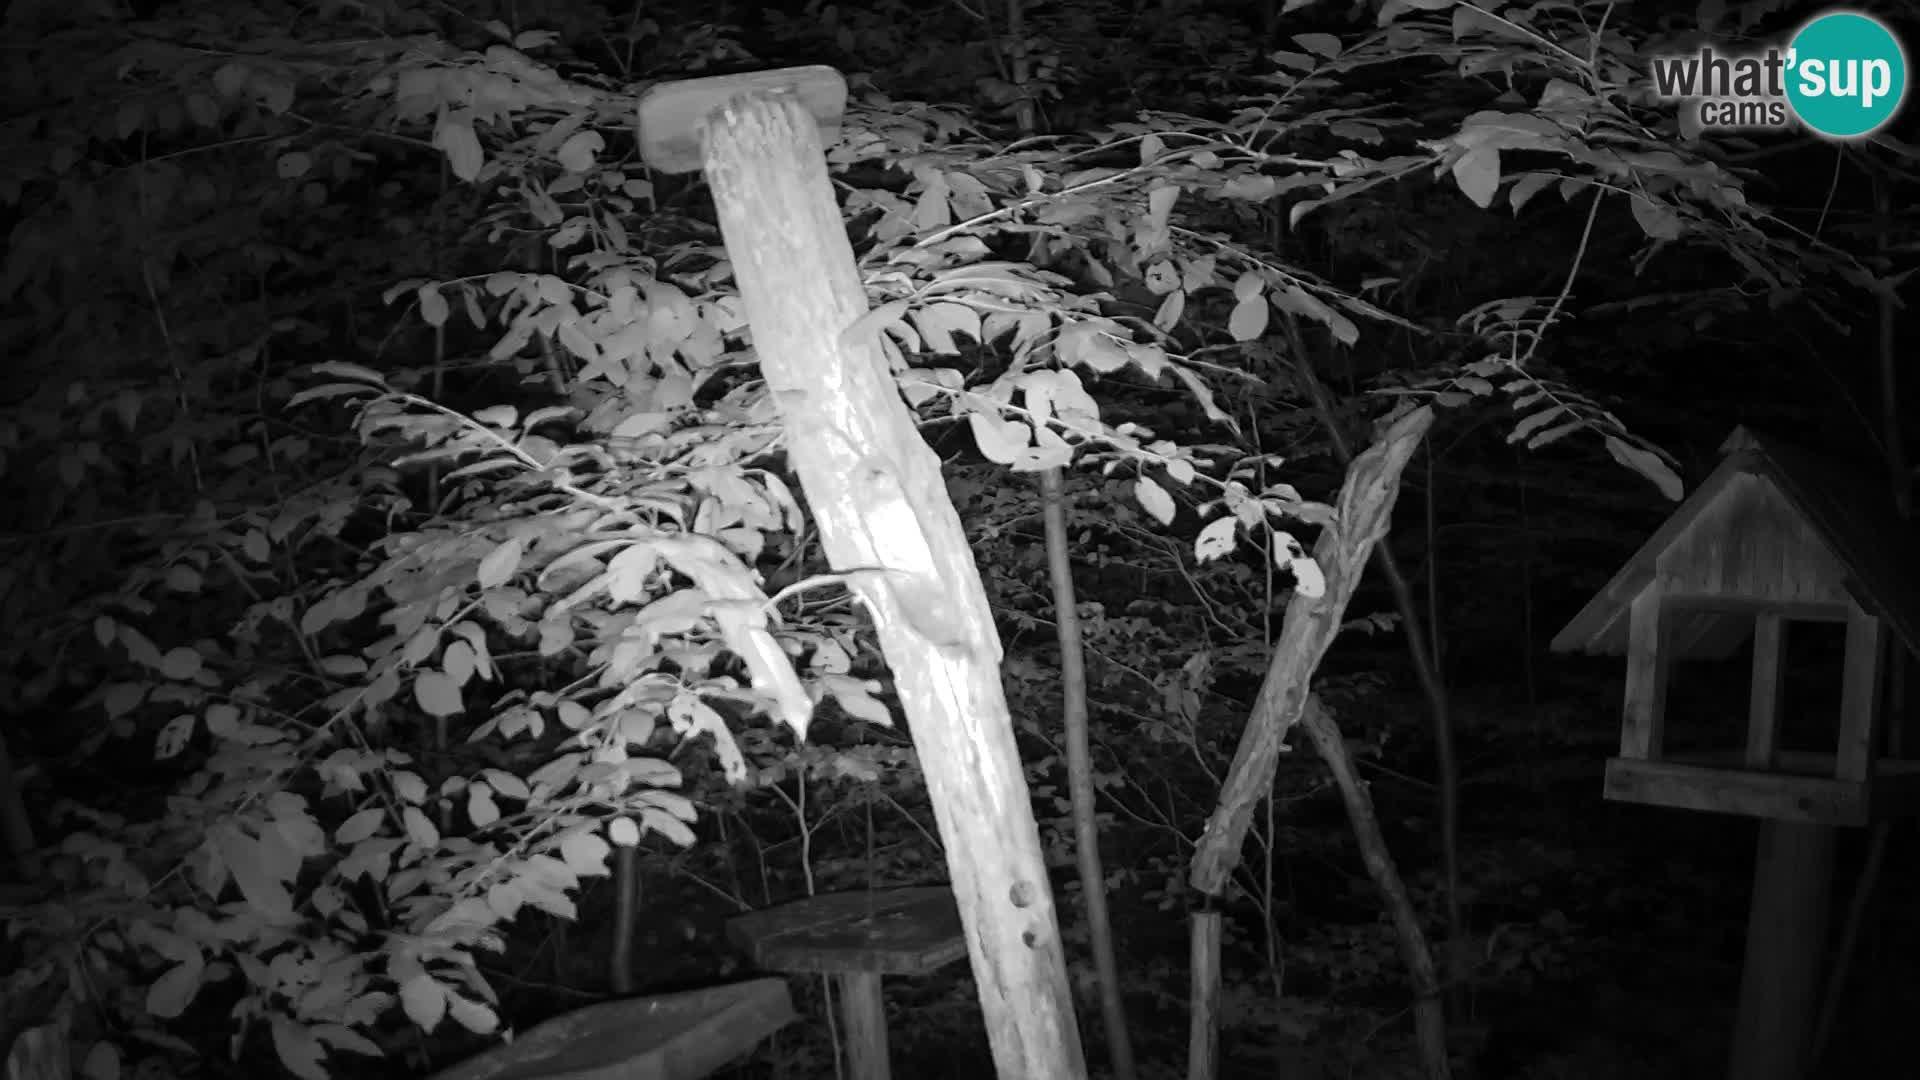 Mangiatoie per uccelli allo ZOO di Lubiana livecam